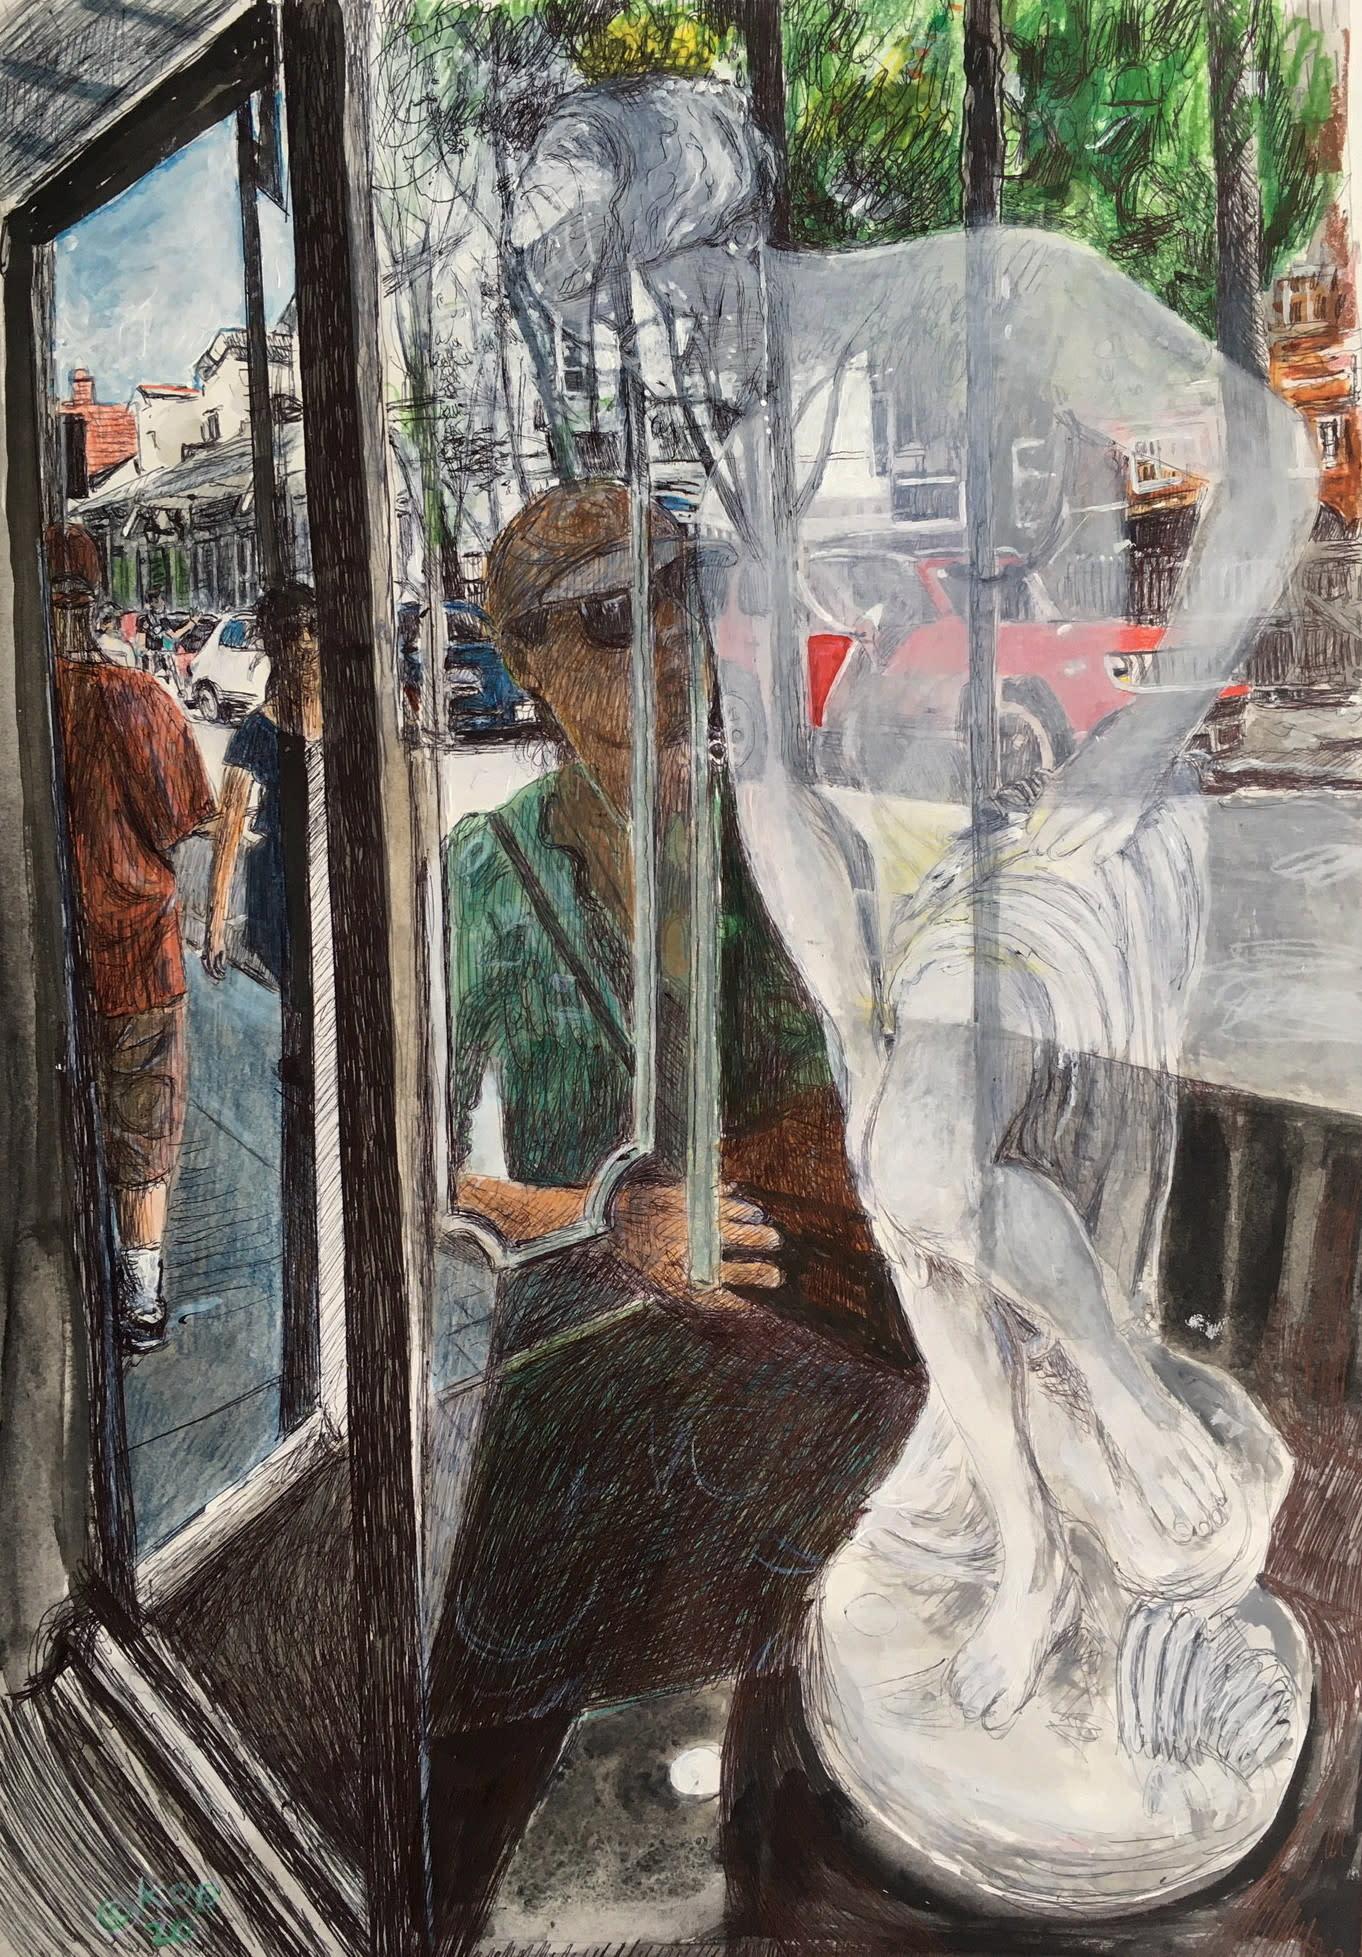 Kobrienstaute in window15x22acrylicprismacolorinkonpaper 1600 rnyms9